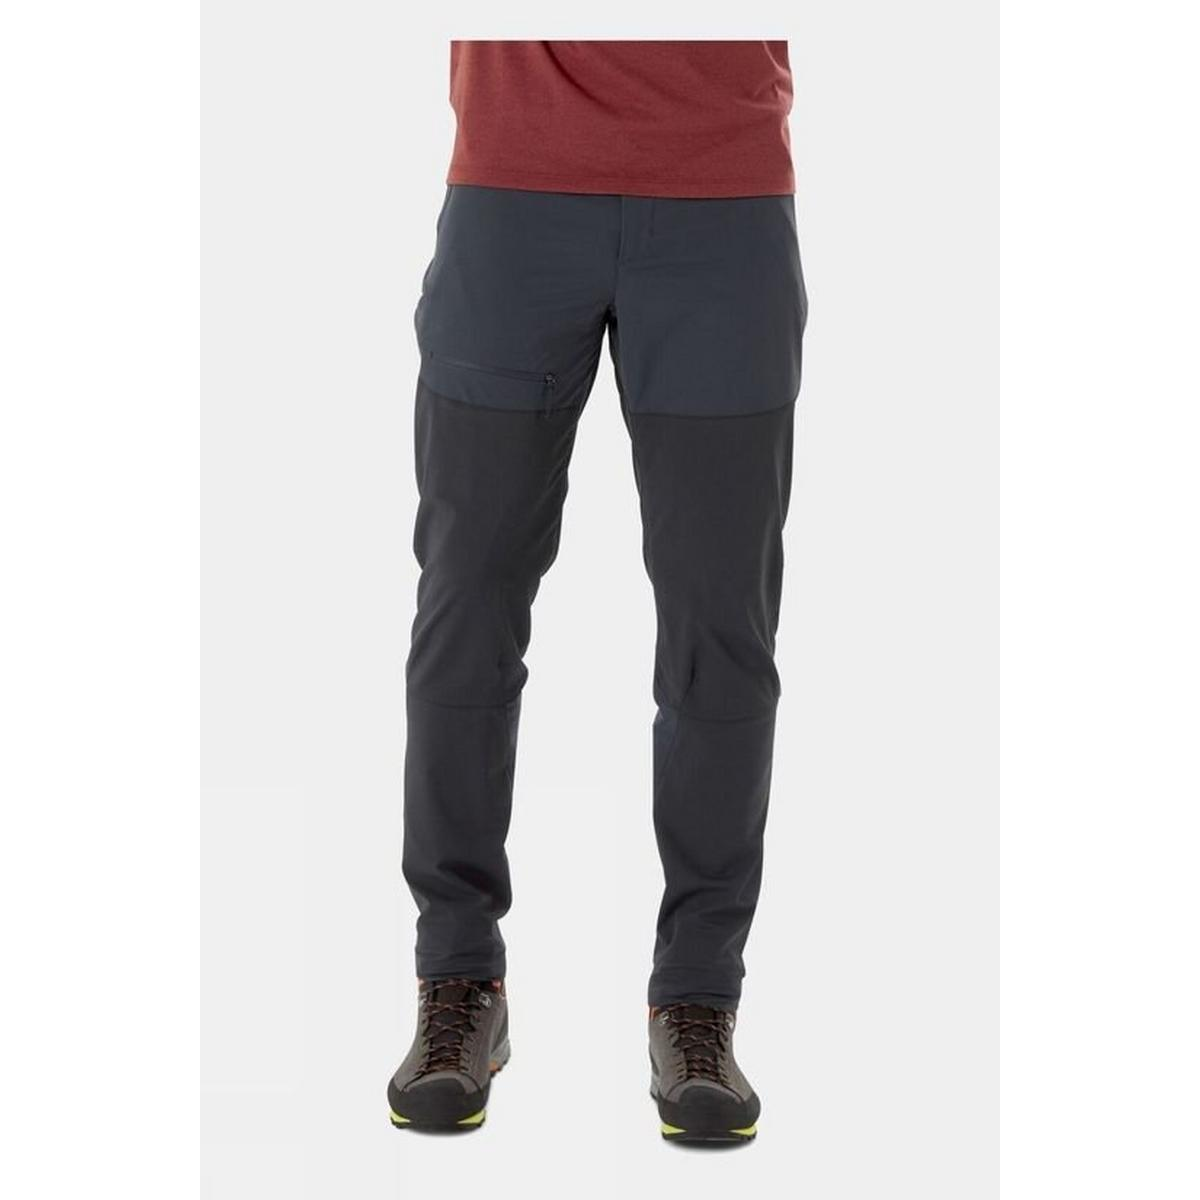 Rab Men's Torque Mountain Pant - Grey